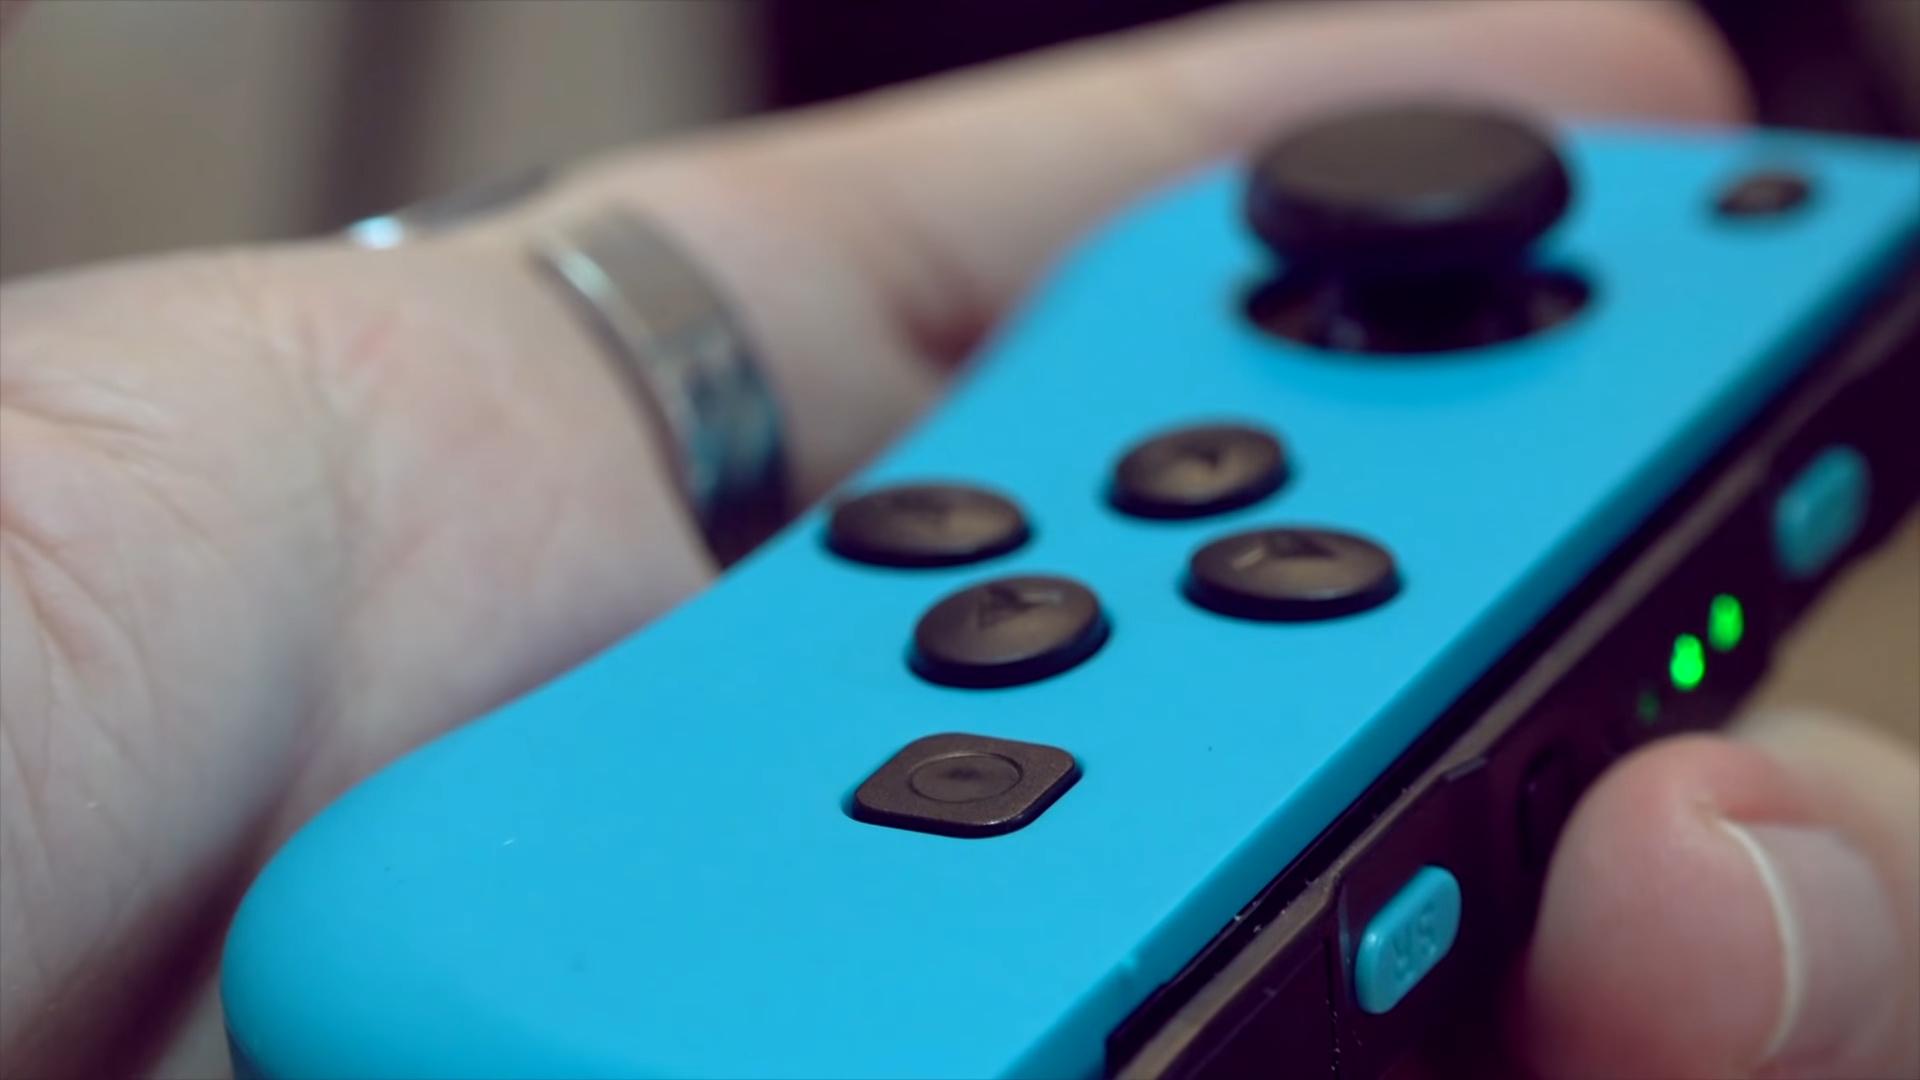 $15 Bootleg Joy-Con For Your Nintendo Switch